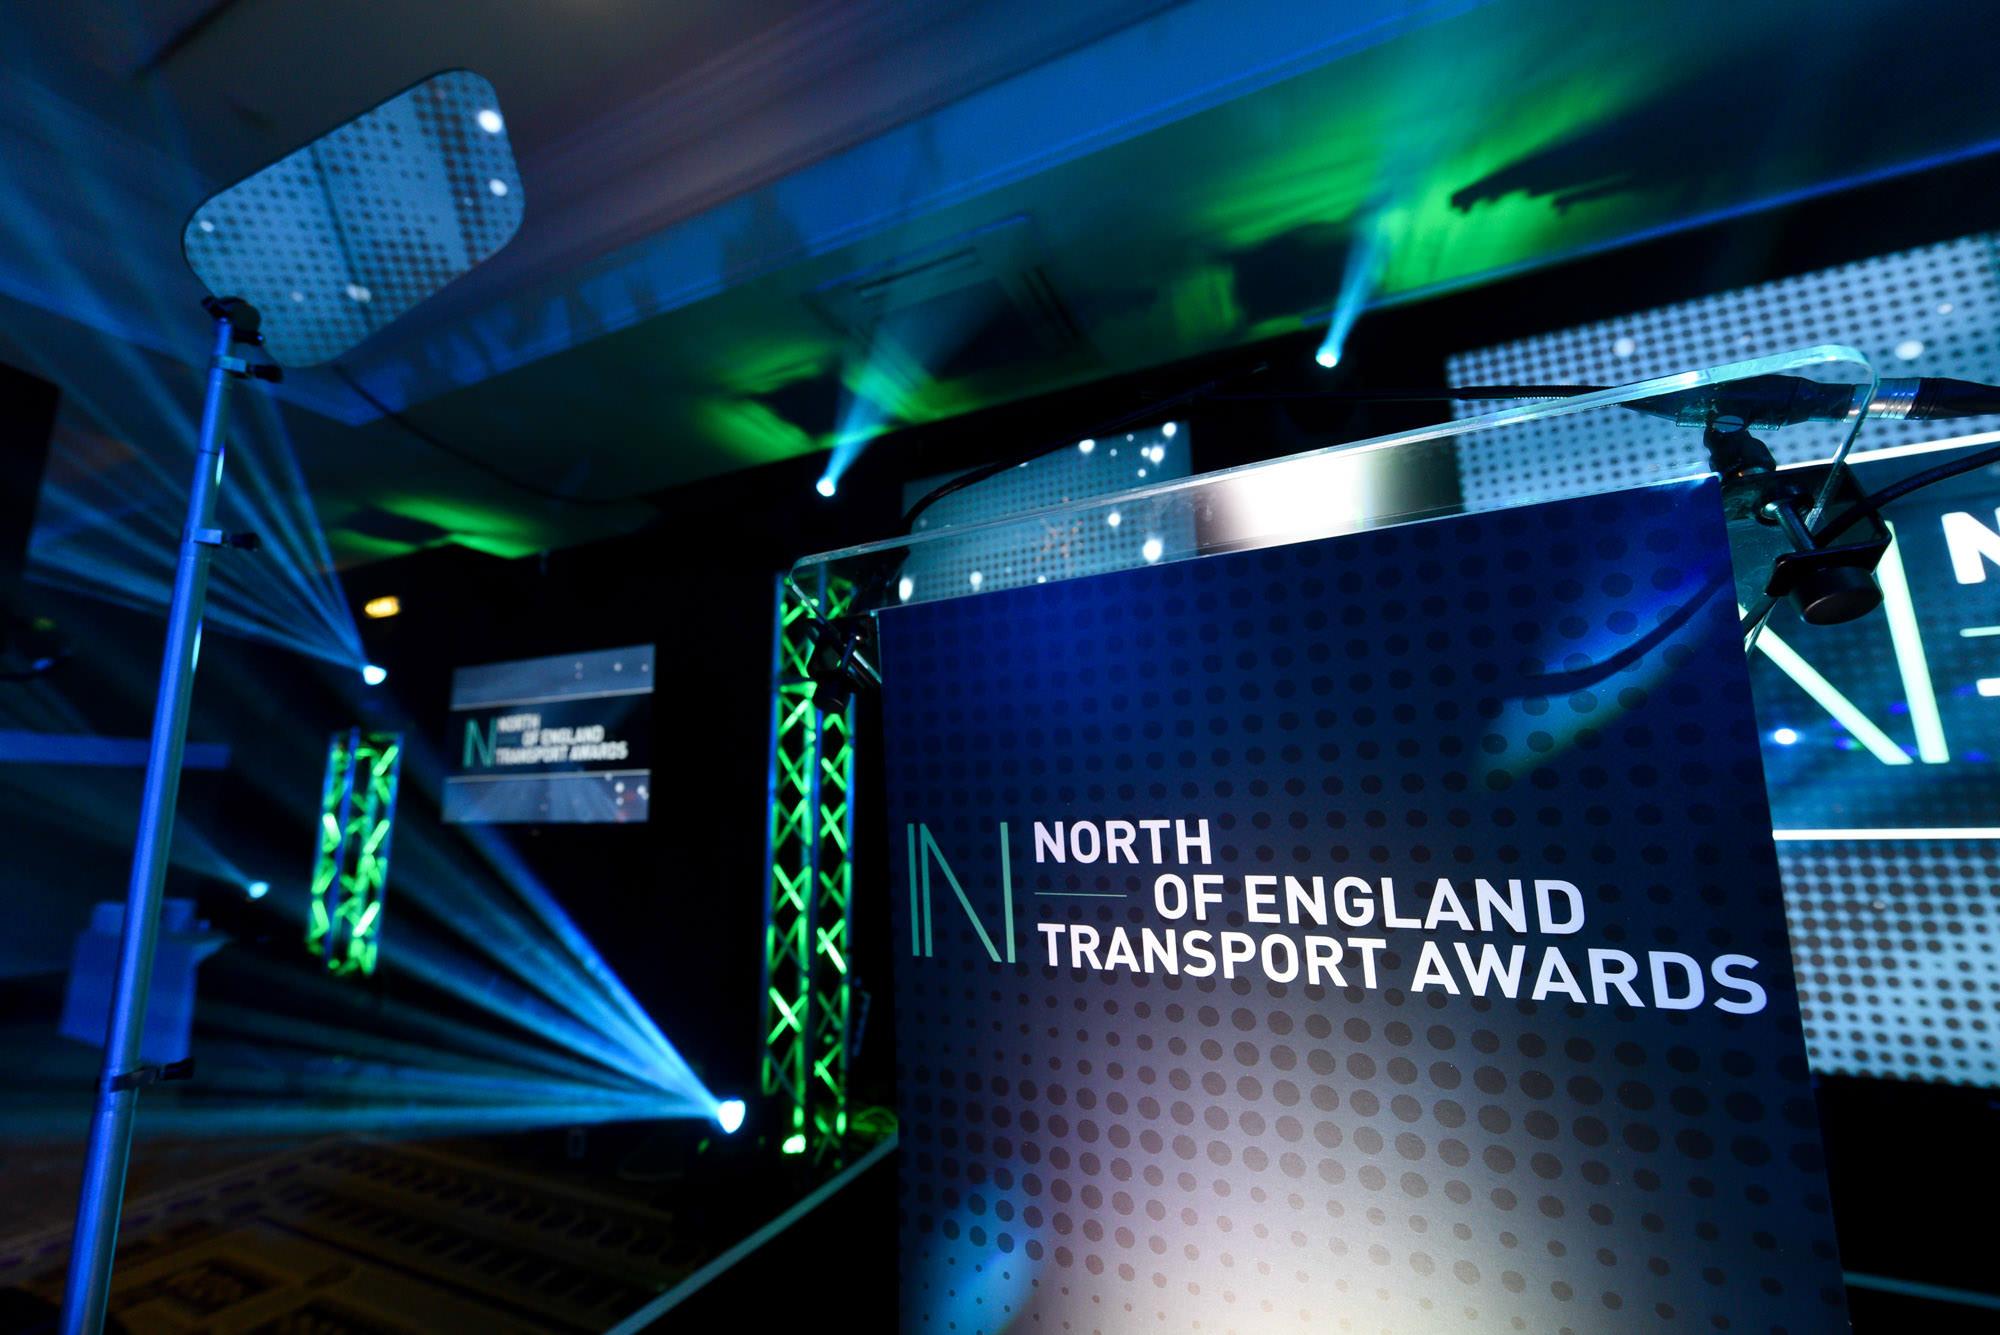 NorthOfEngland_TransportAwards_8.jpg